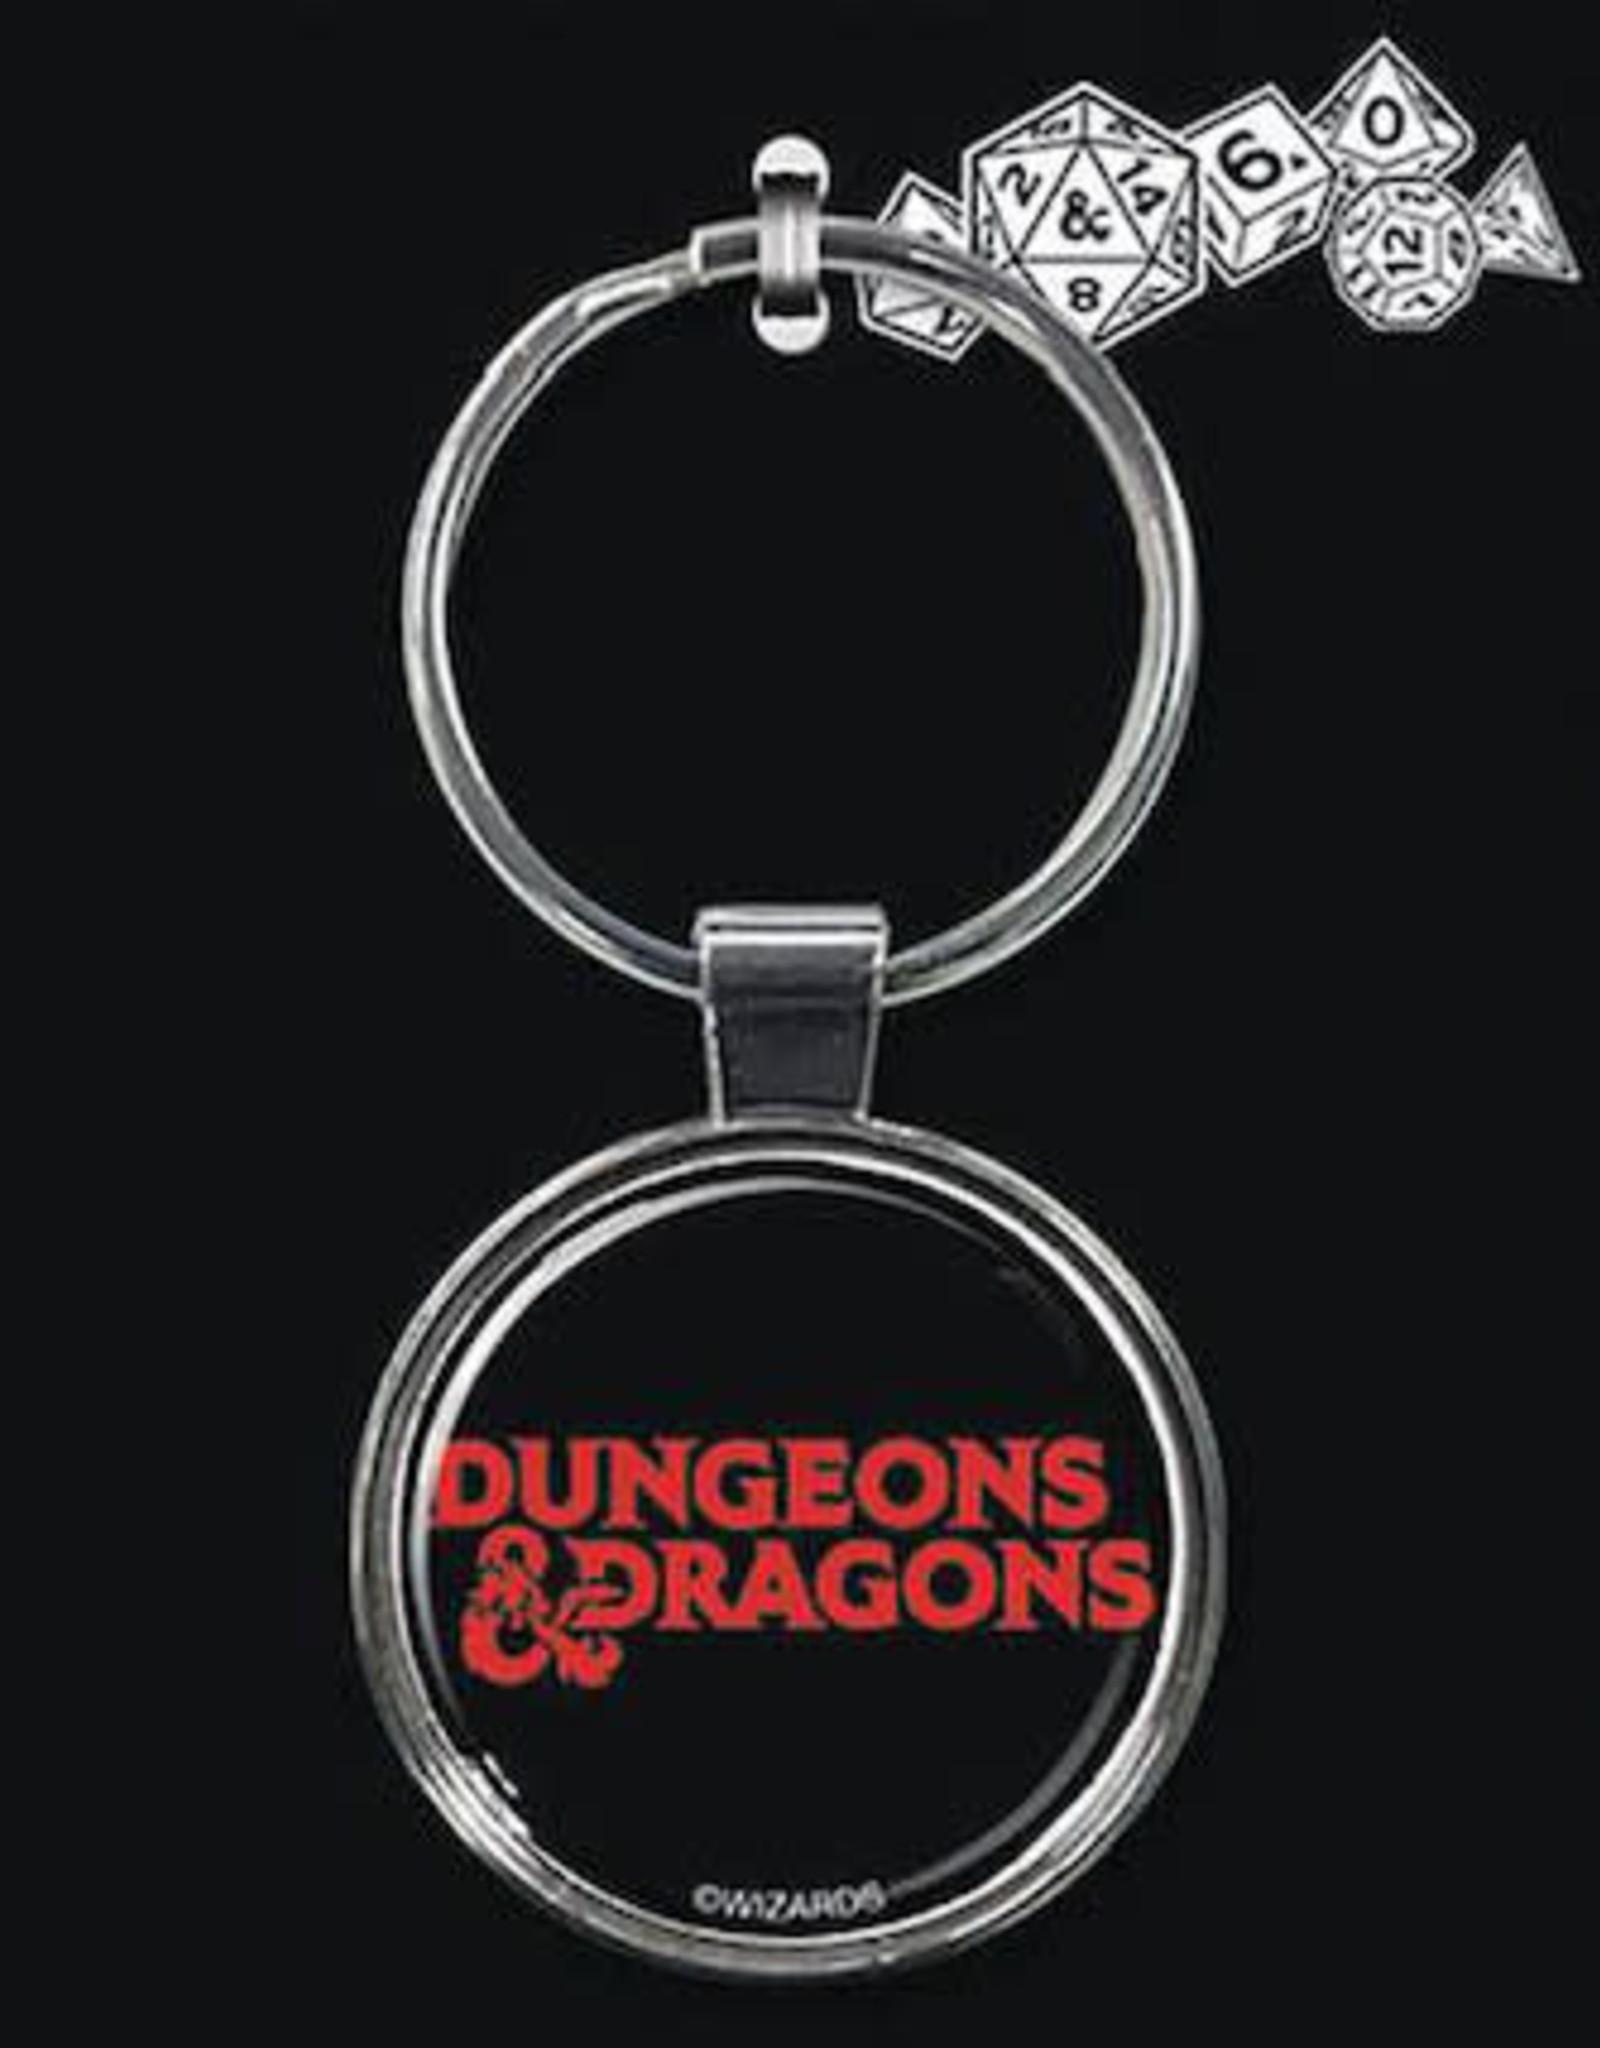 Ata Boy Dungeons & Dragons Keychain: Logo